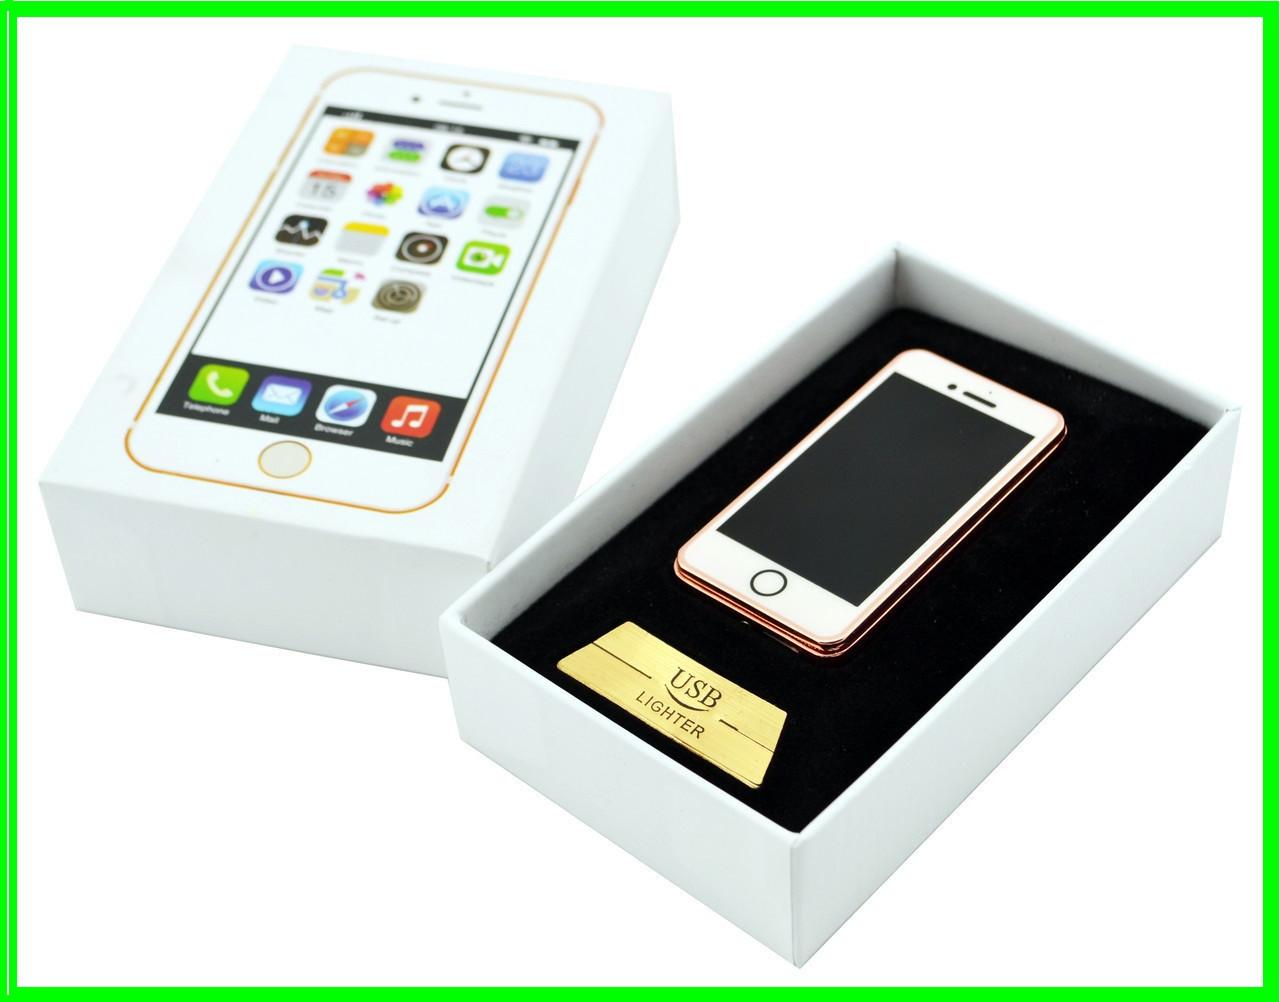 ✅ Электрическая USB Зажигалка iPhone на Аккумуляторе (ВидеоОбзор)